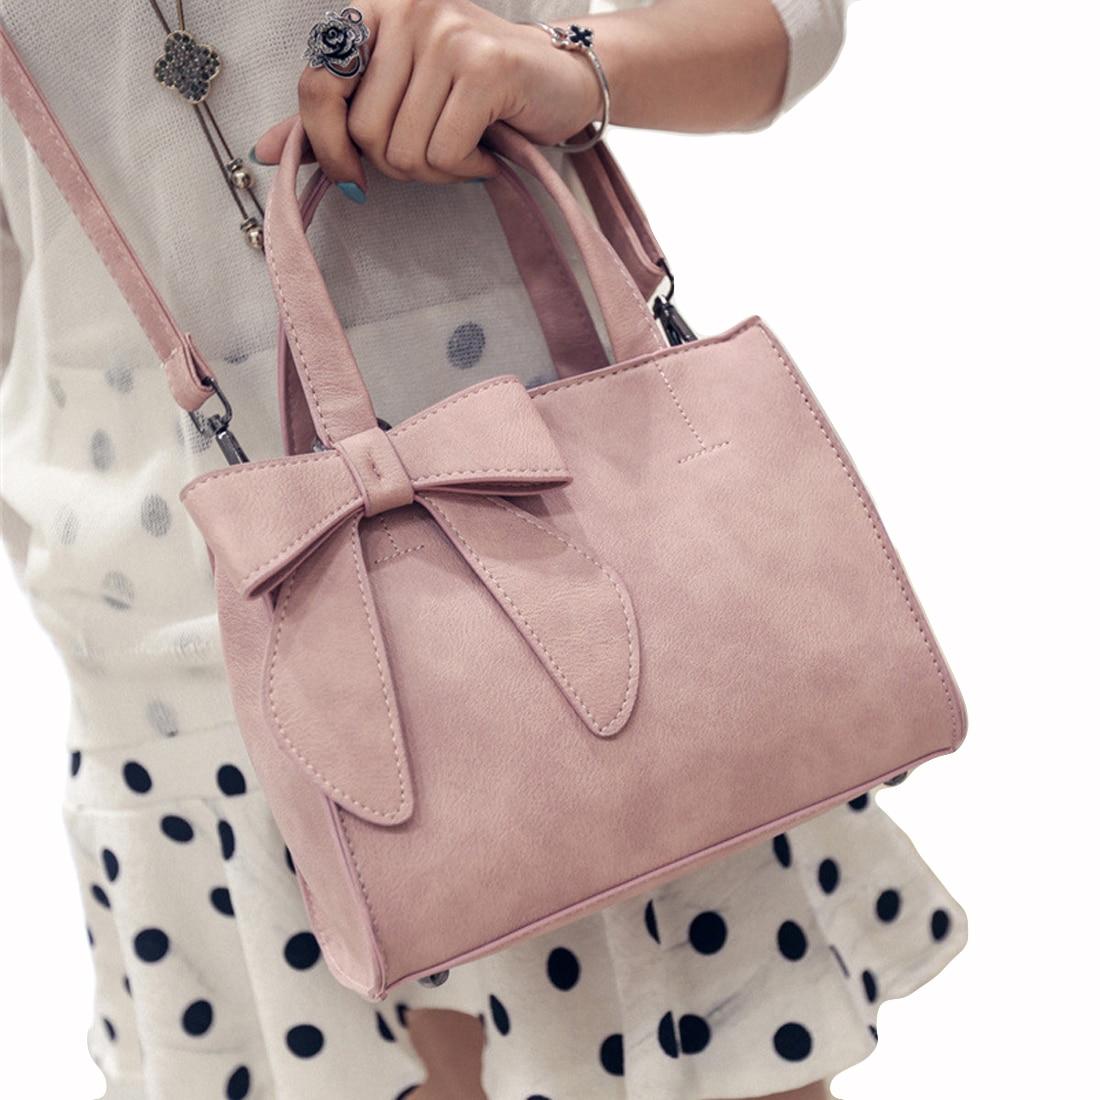 High quality leather bag ladies handbags 2017 girls elegant bowtie Women messenger bags handbags women famous